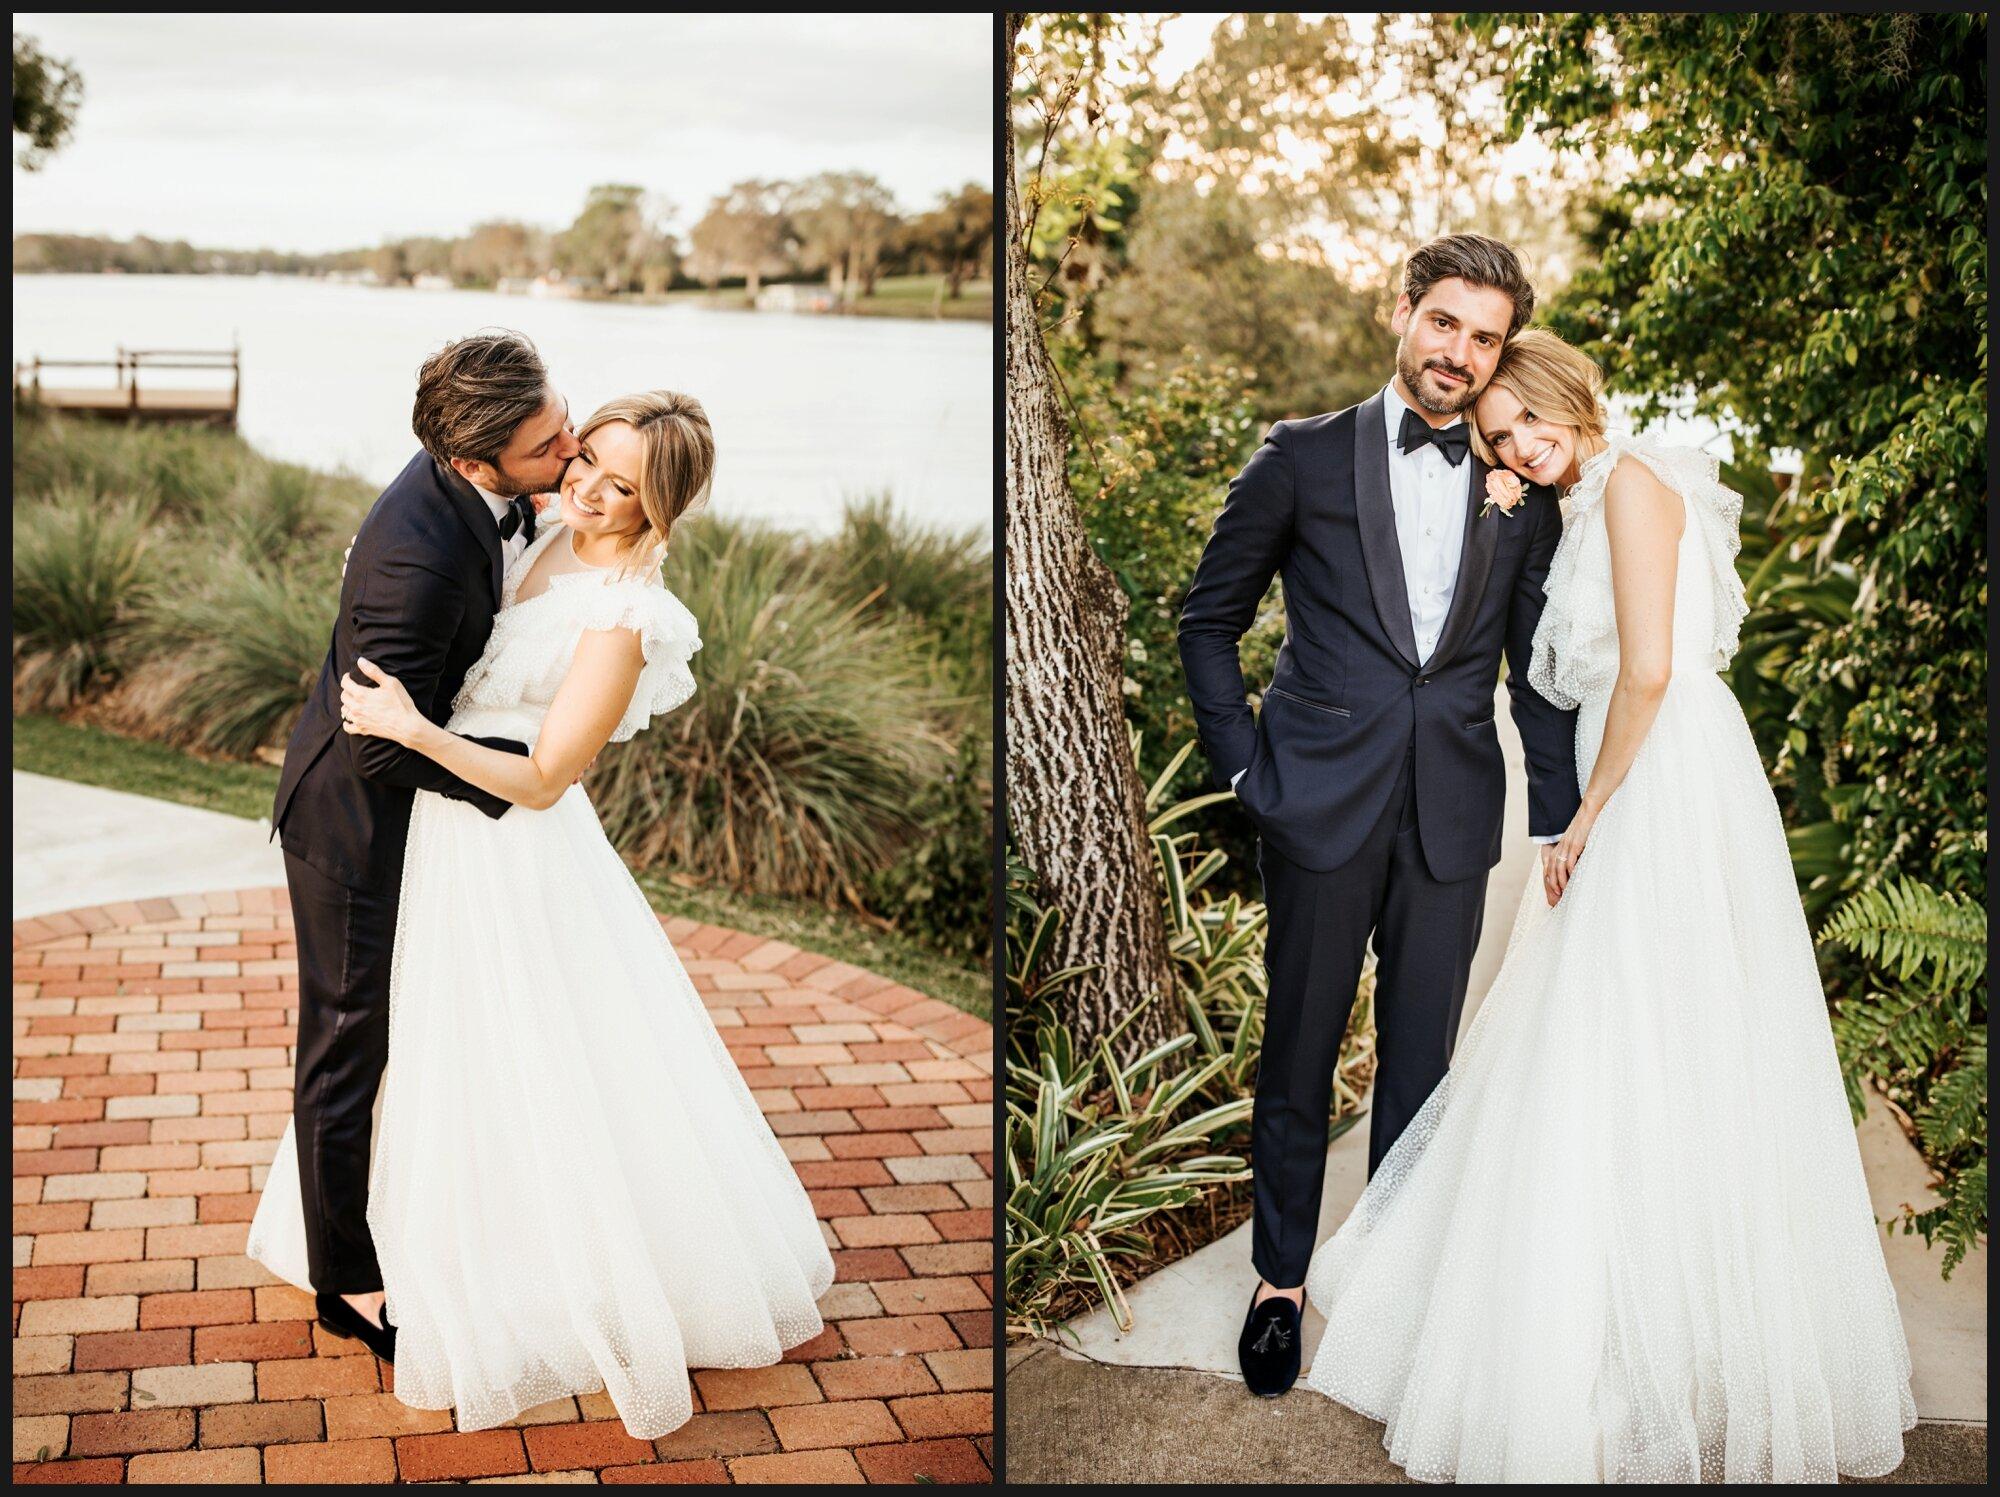 Orlando-Wedding-Photographer-destination-wedding-photographer-florida-wedding-photographer-hawaii-wedding-photographer_0710.jpg